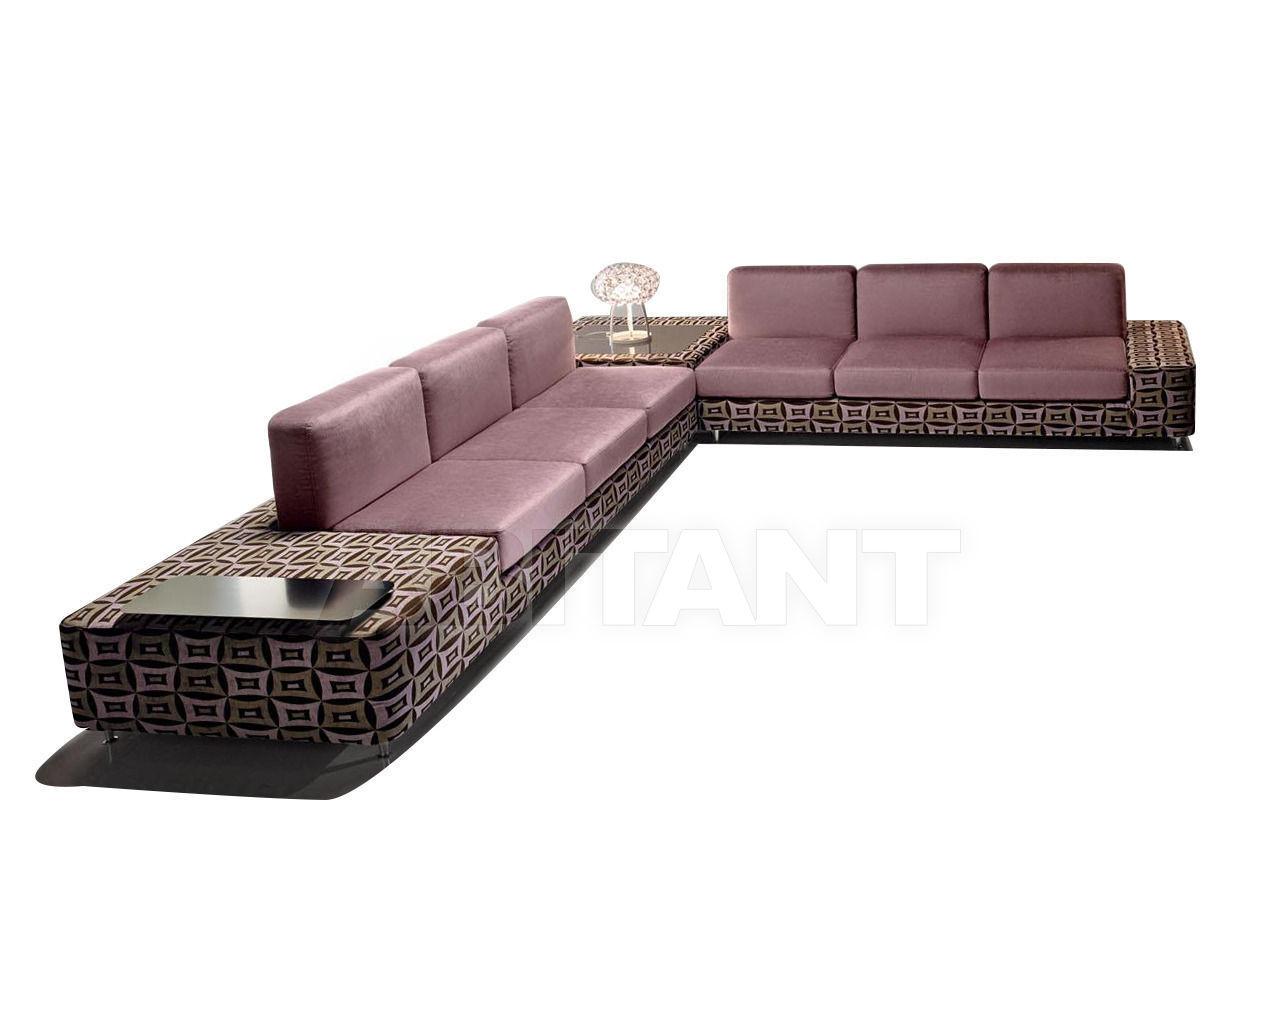 Buy Sofa Adrenalina S-bench S-oft Sofa